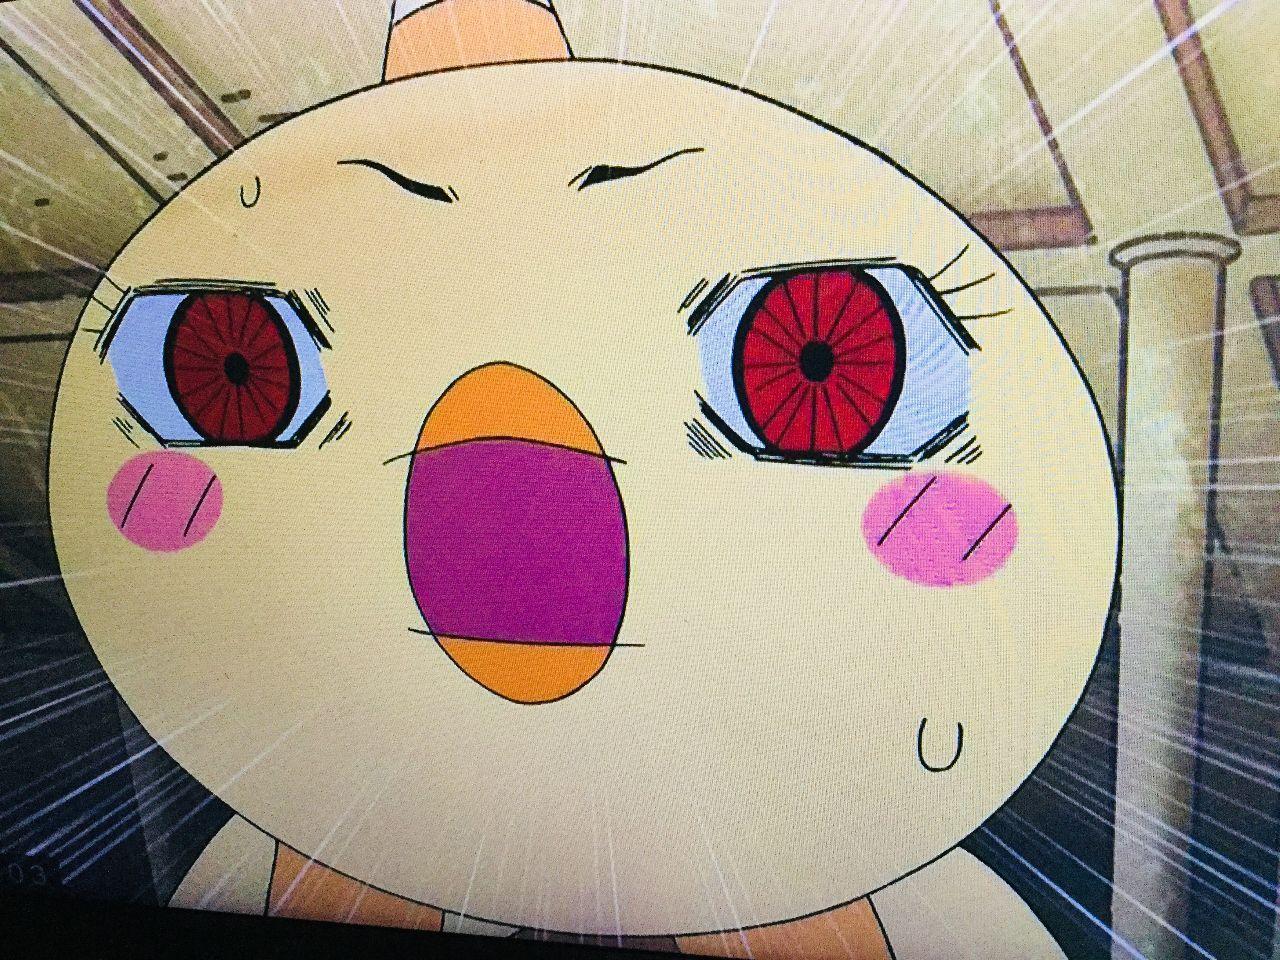 usdjpy - アメリカ ドル / 日本 円 アンケート結果見てかけてる人が結構いるみたいダッピ。オラビックリしたッピ。